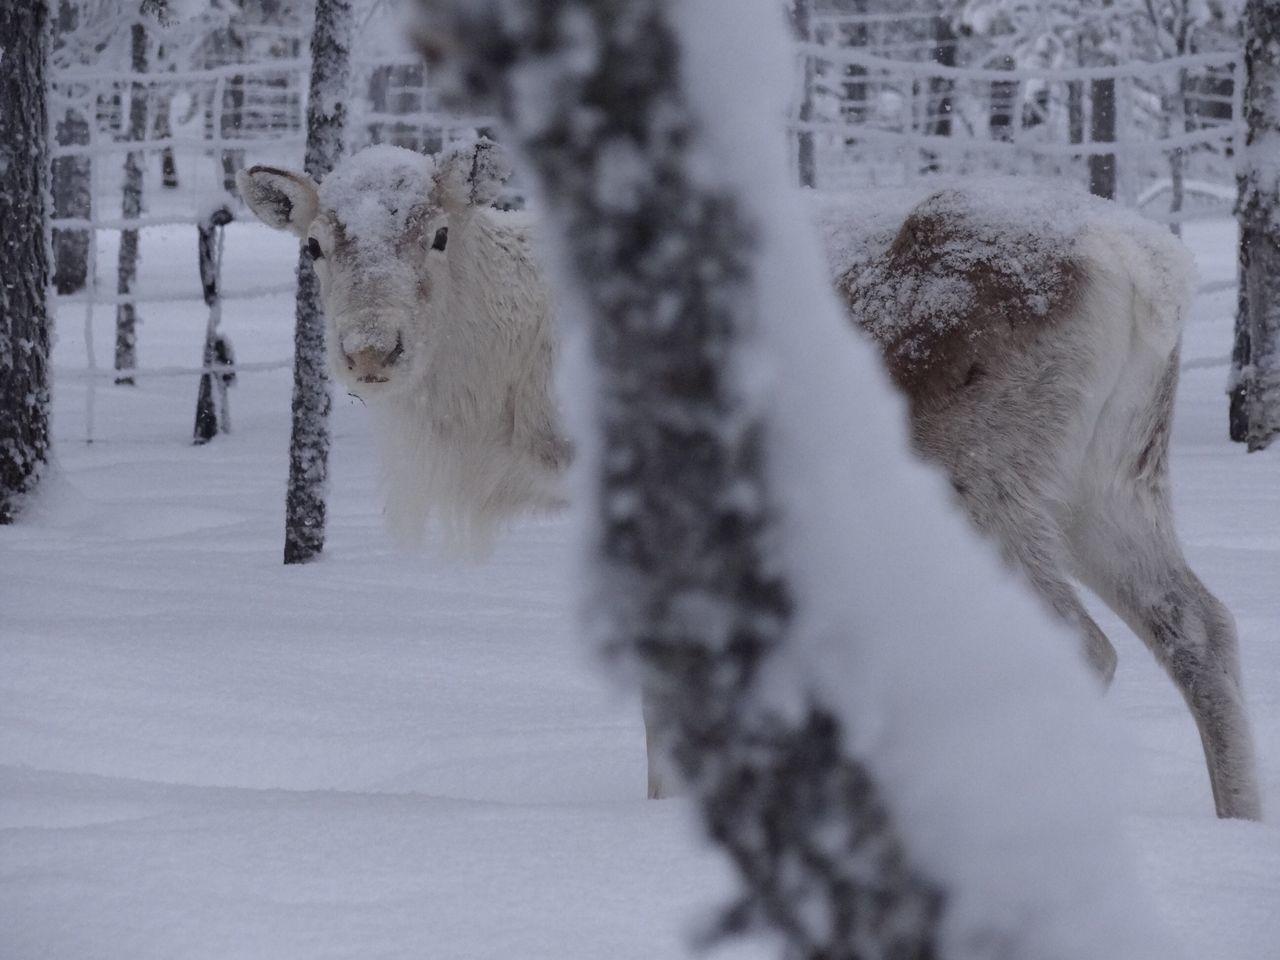 Snow Snow ❄ Snow Day Lapland Animals Animal Animal Photography Animal_collection Animal Themes Mimetism White EyeEm Best Shots EyeEm Nature Lover Snow Sports